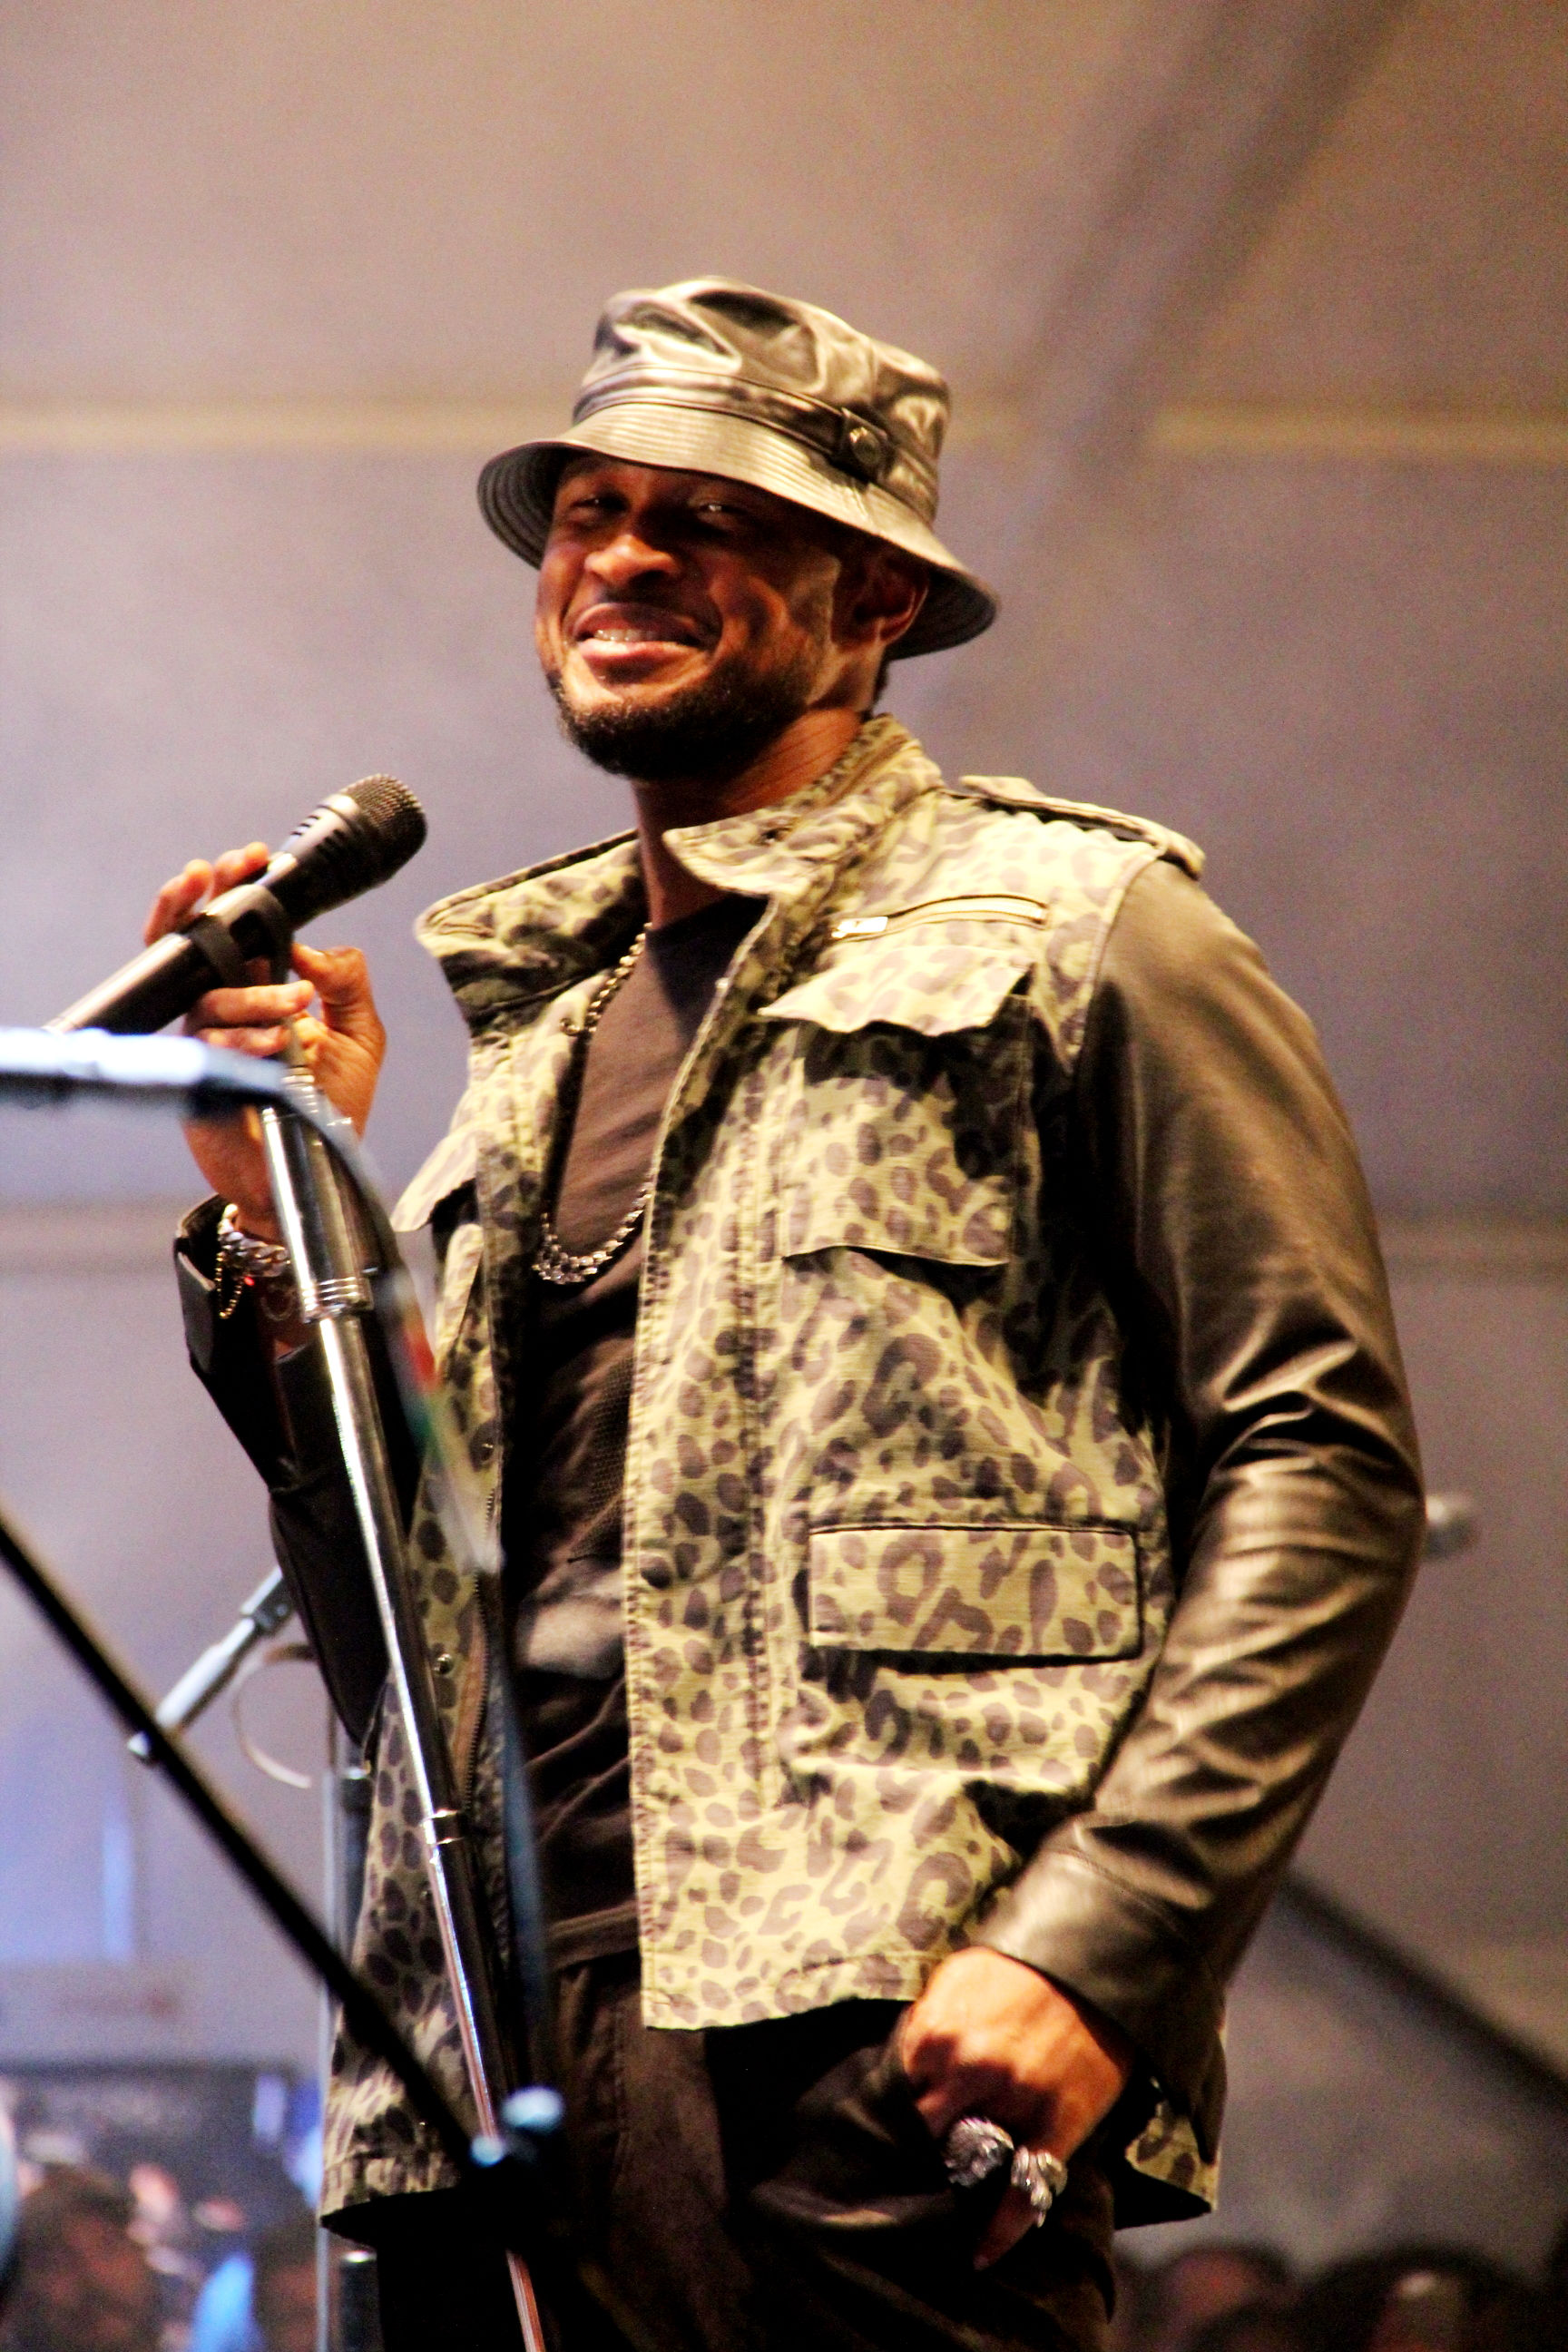 Photo of Usher (singer): Singer from the United States